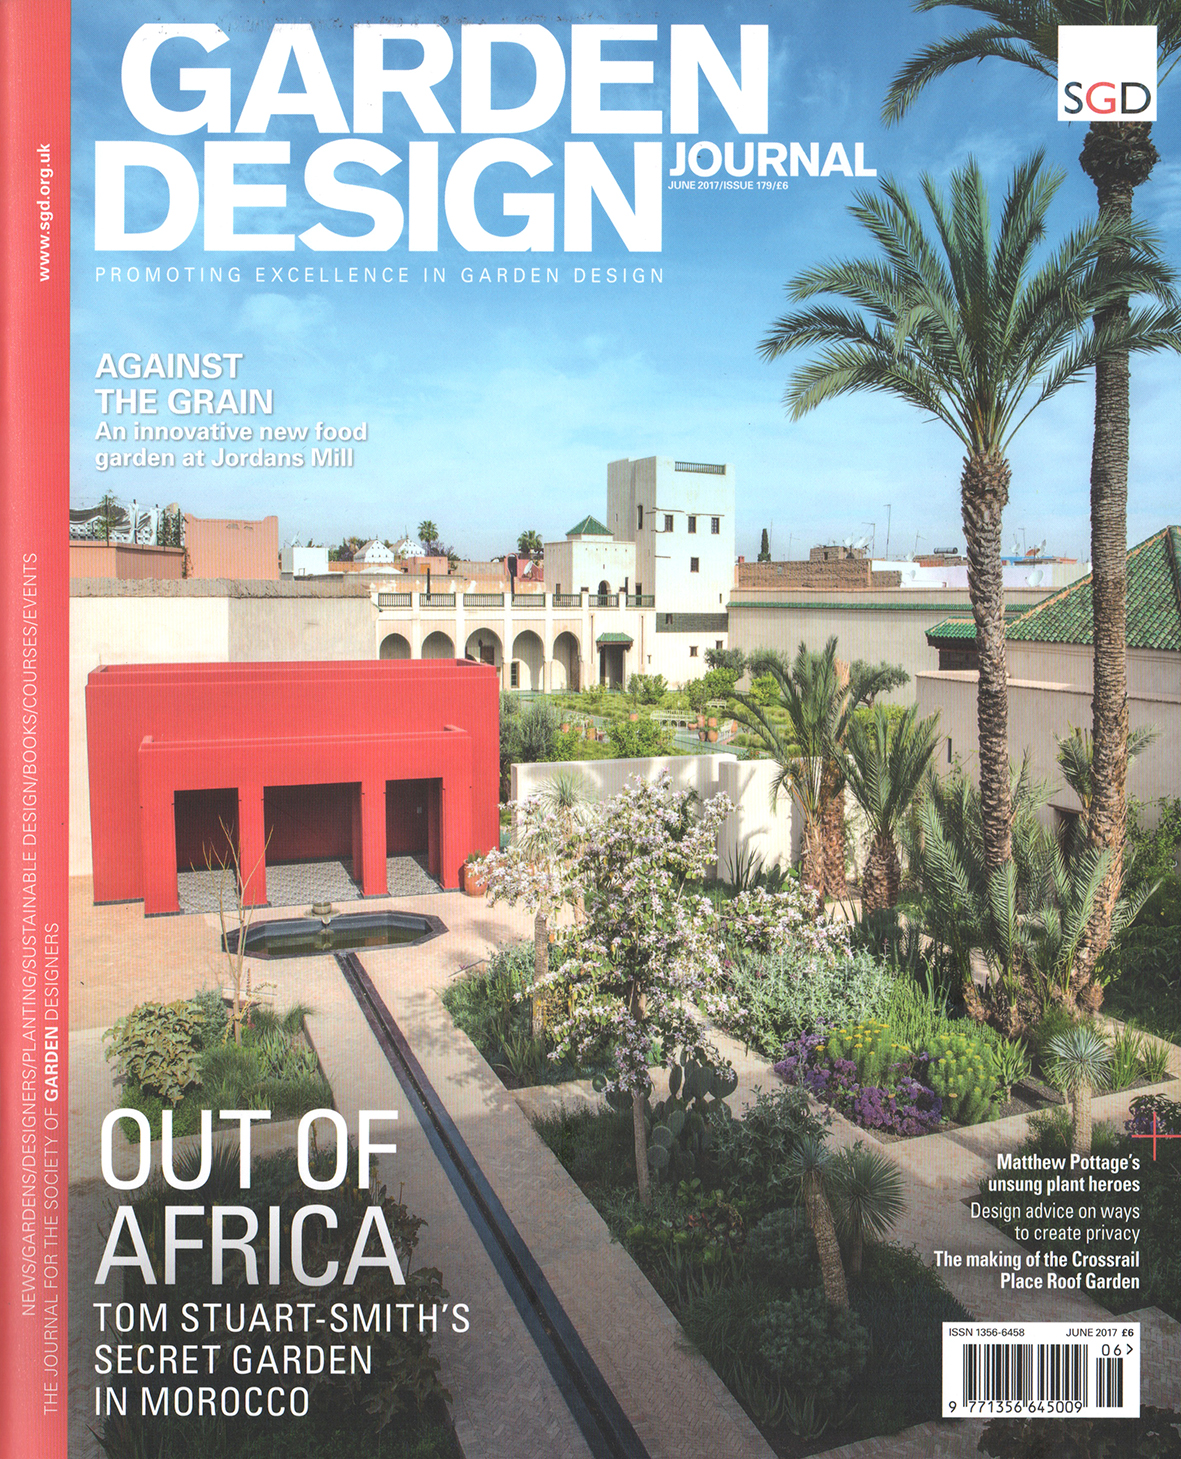 Garden Design journal June 2017